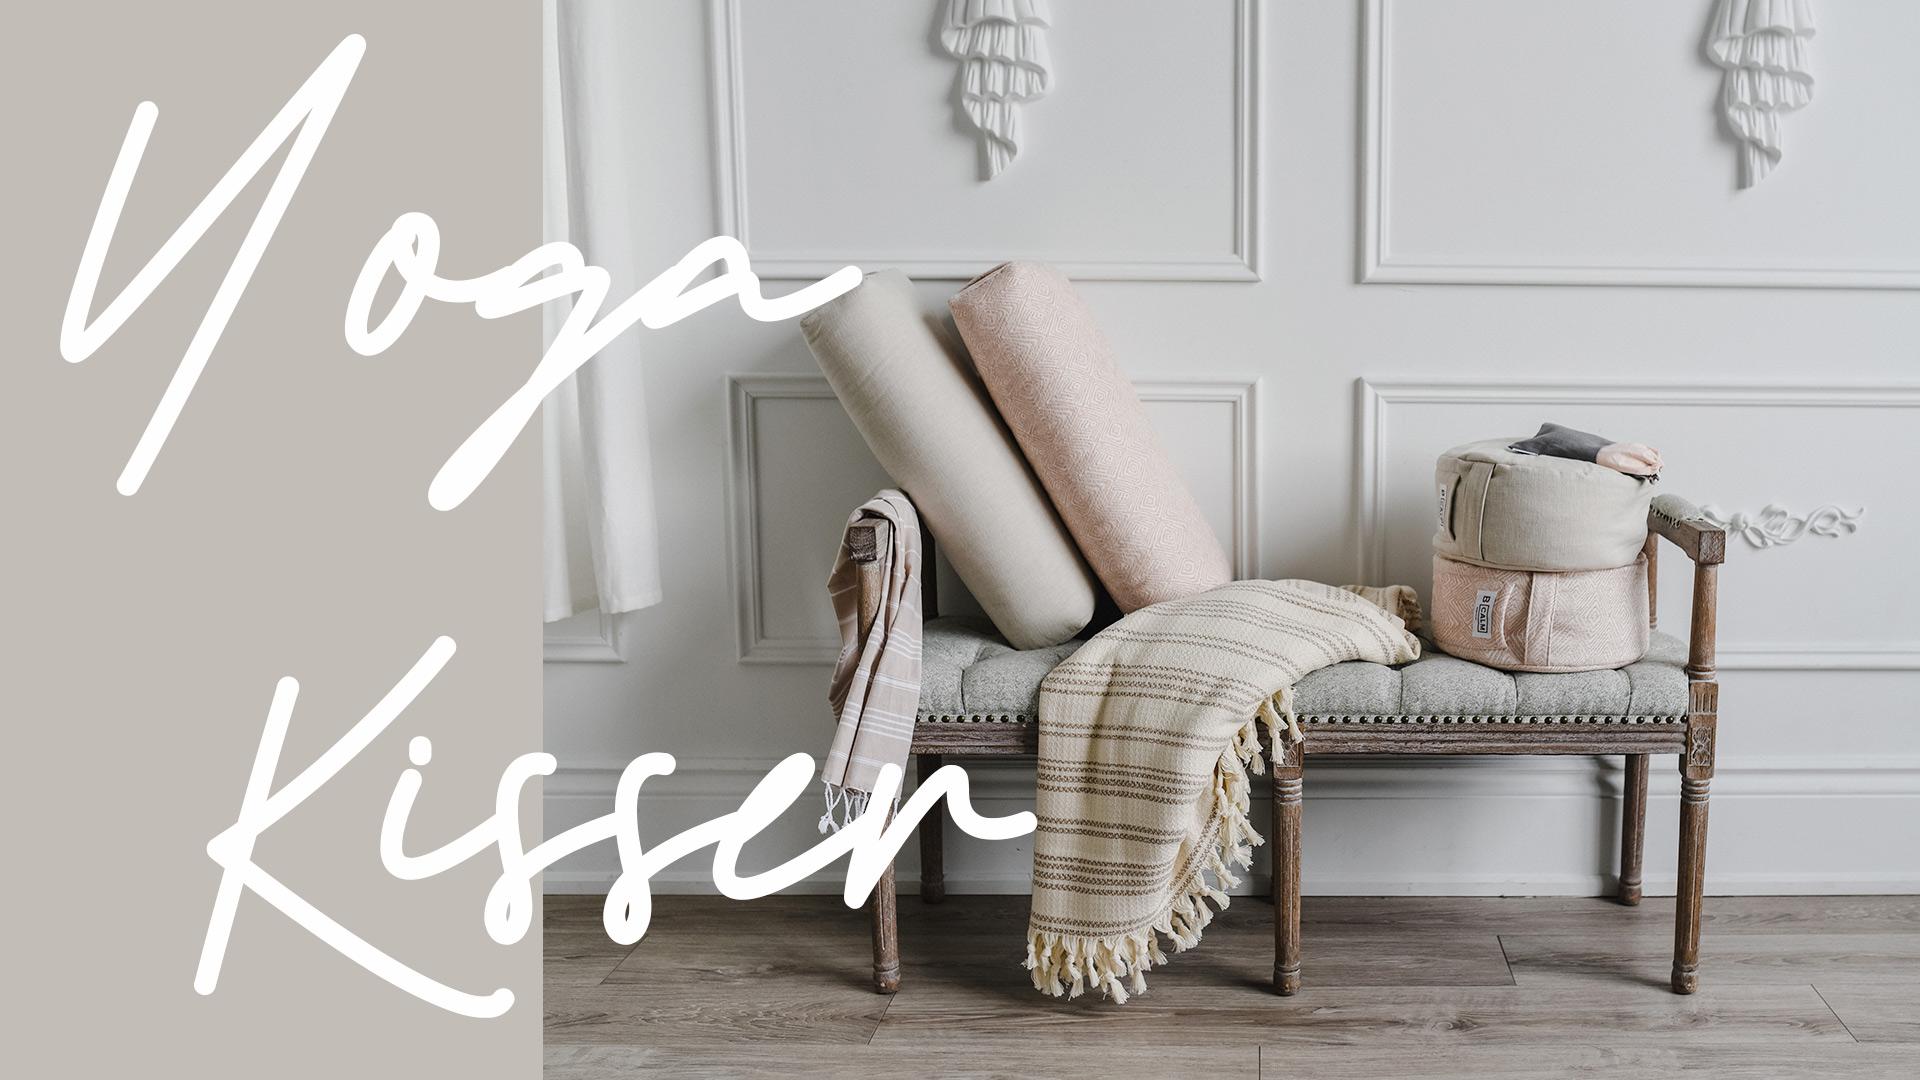 Yogakissen kaufen 2021